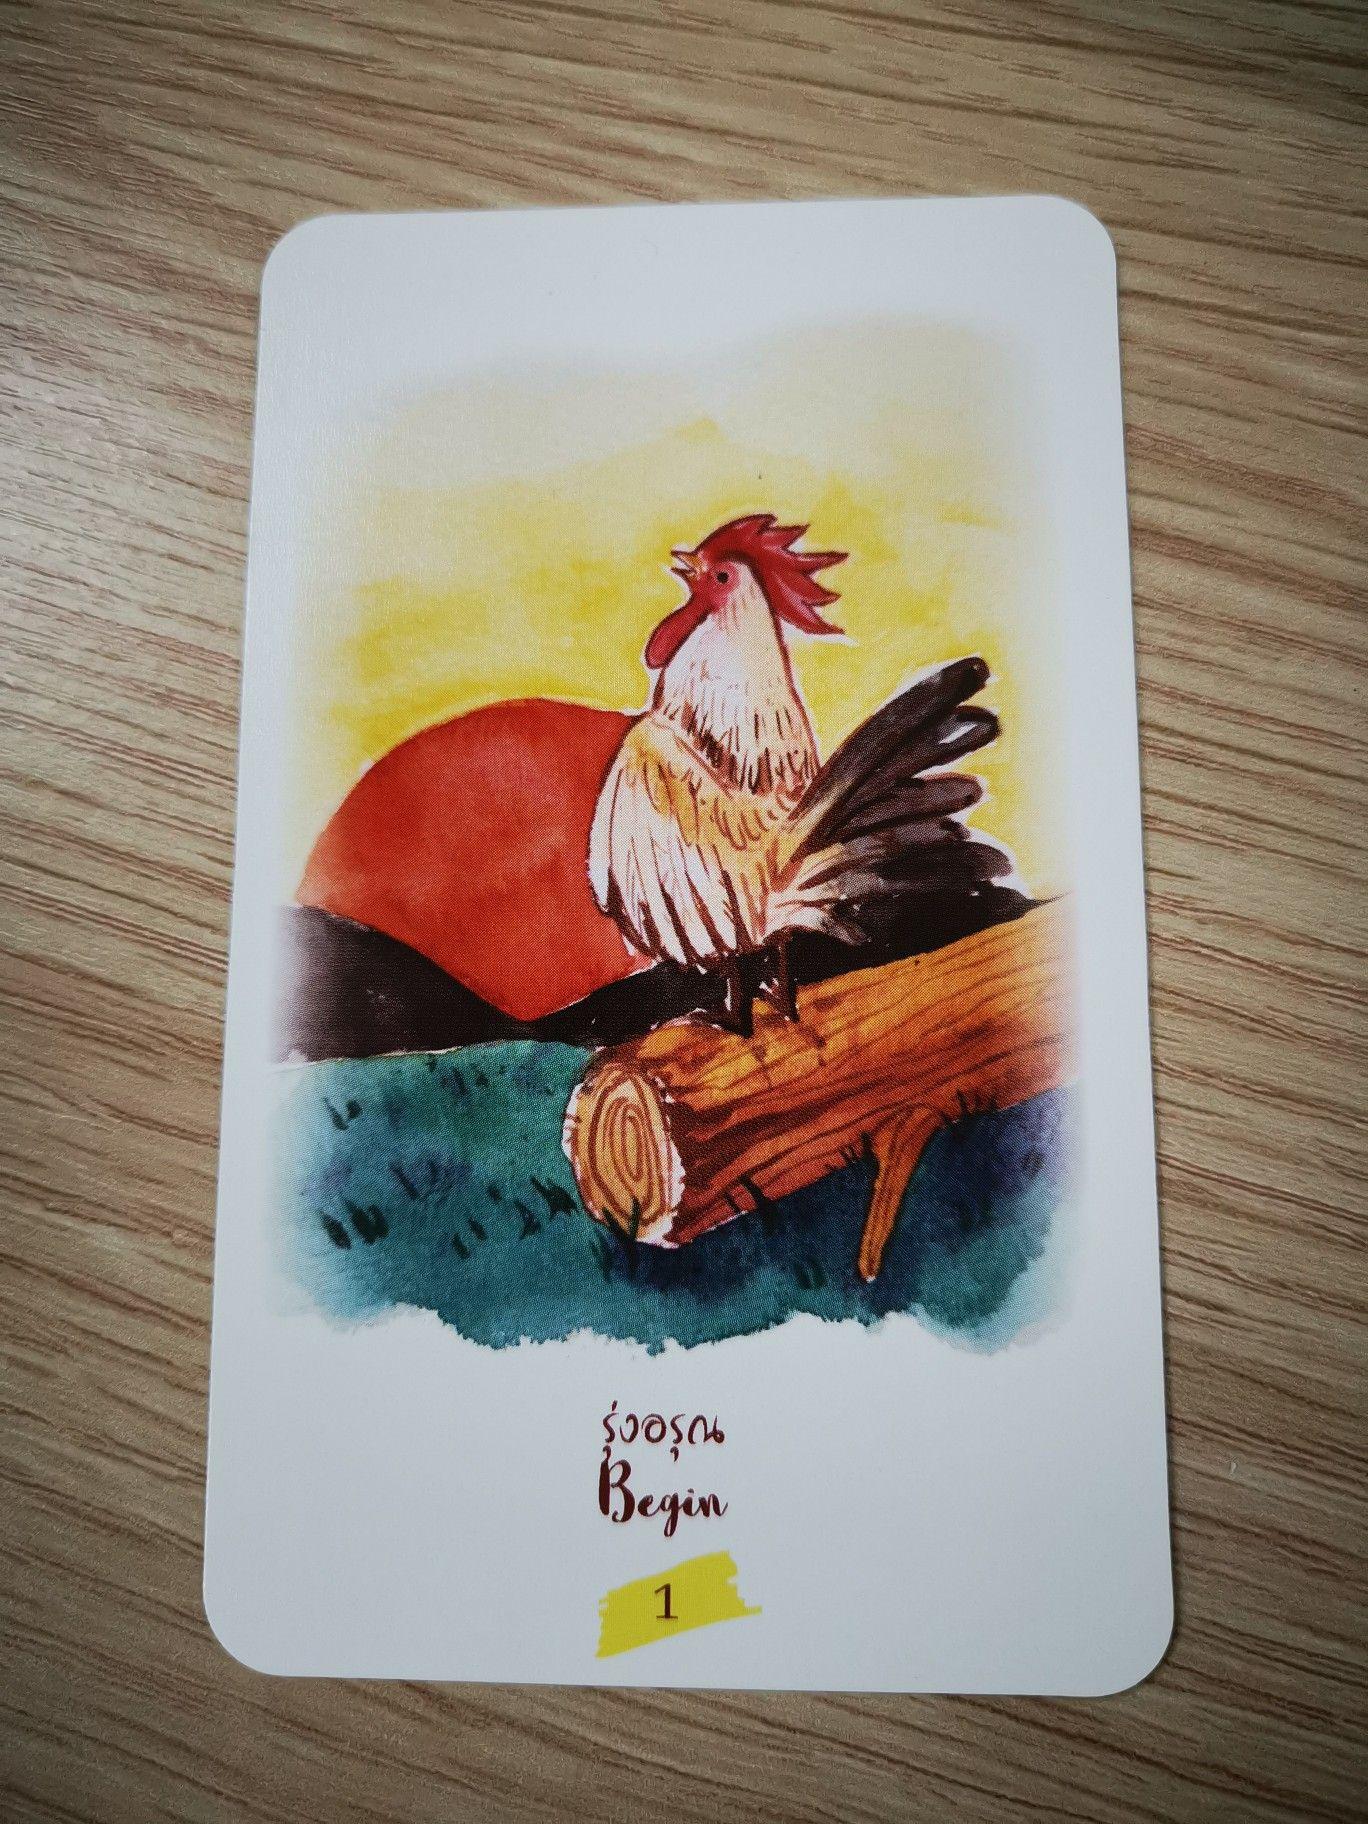 Bossatarot tarot tarotcard tarotdeck thaitarot